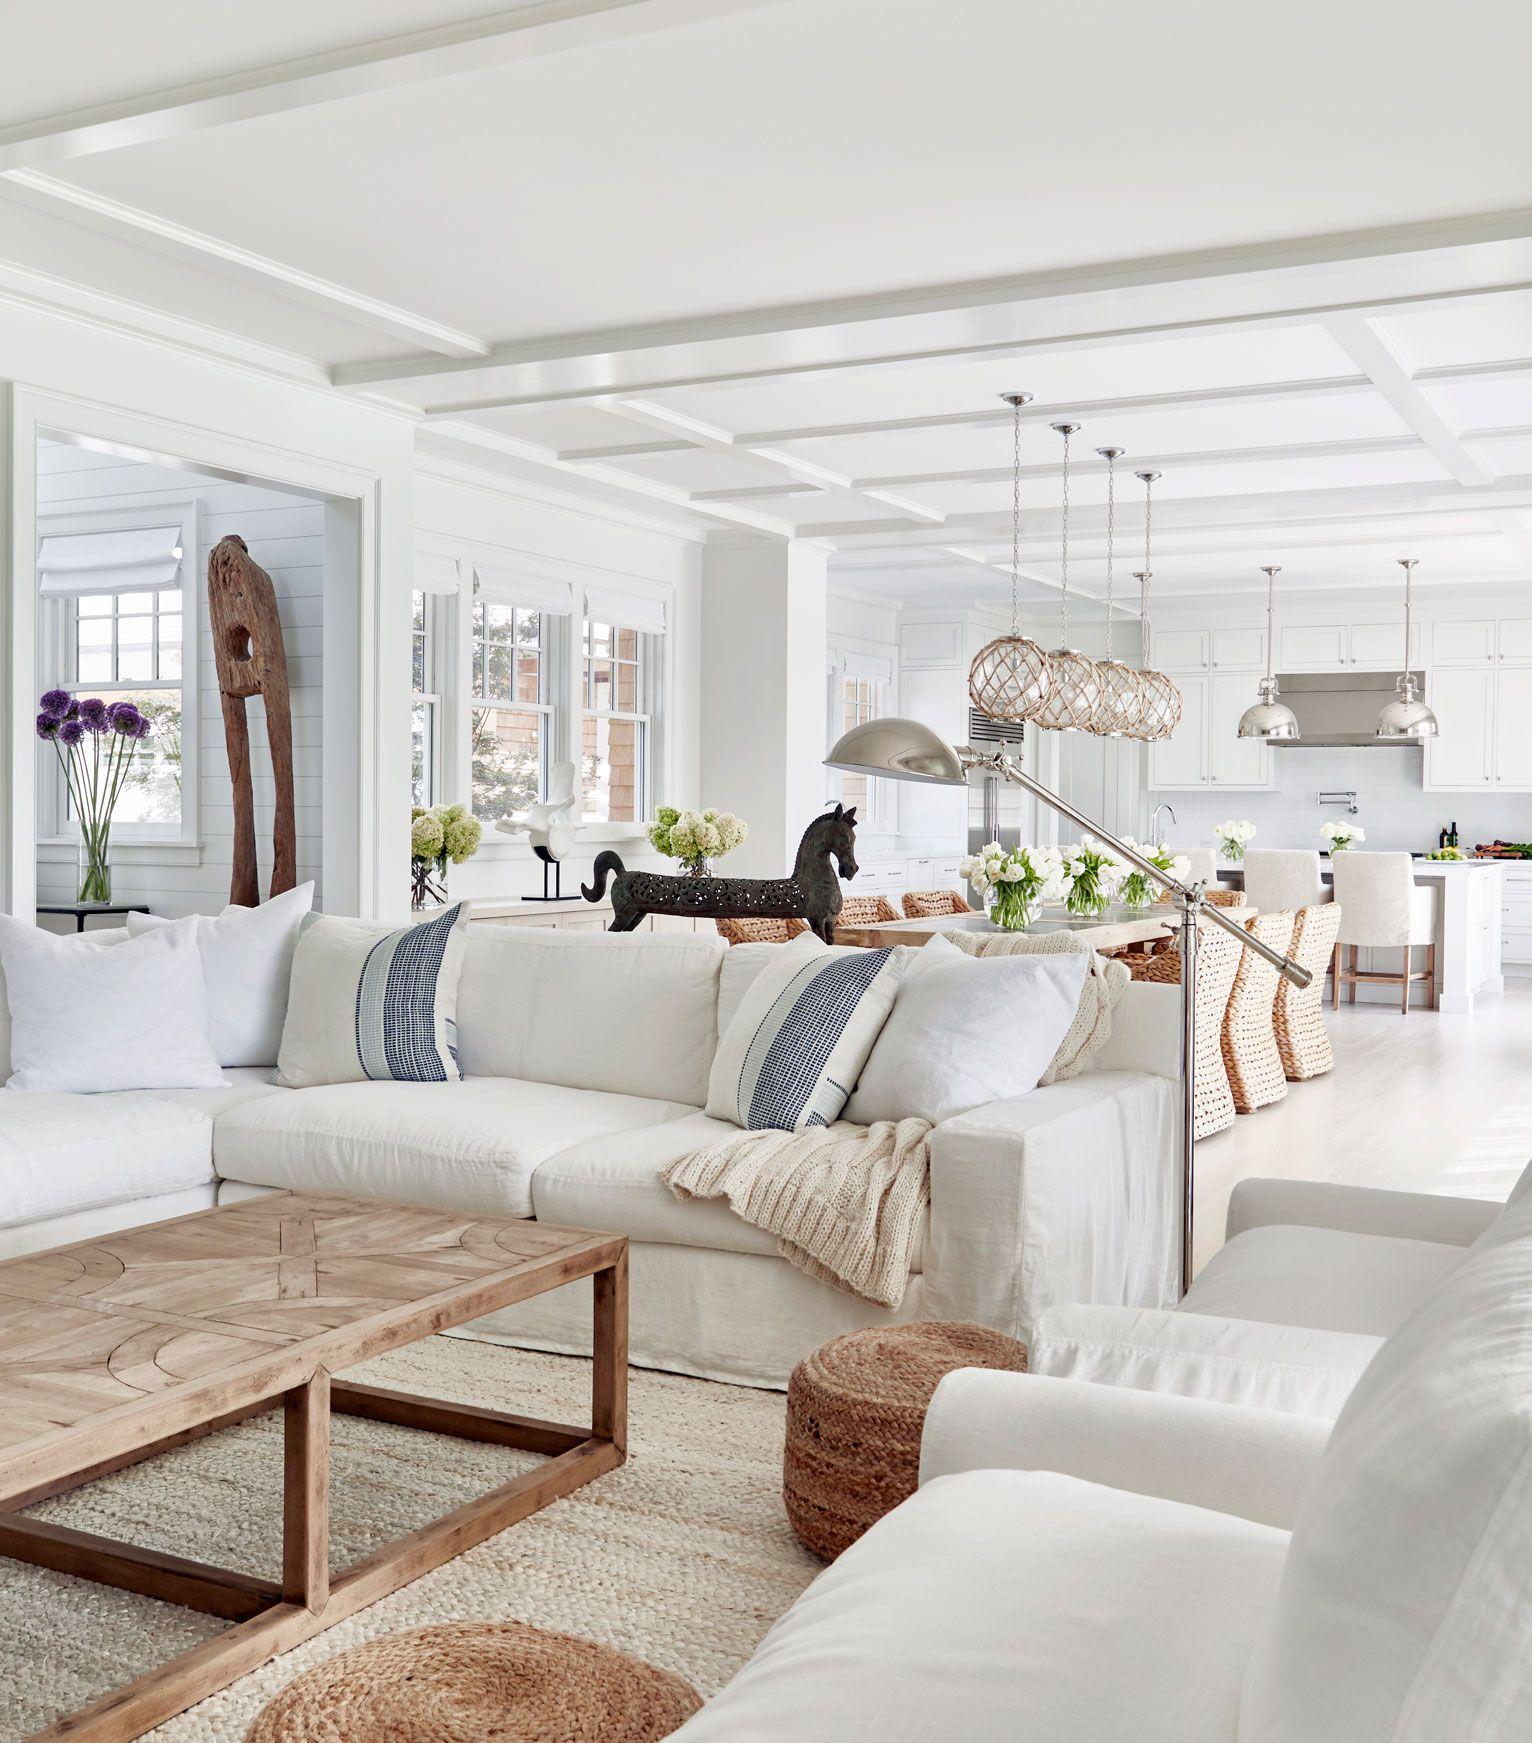 Amagansett Beach House Open Plan Living Open Layout And Beaches - Interior designed houses